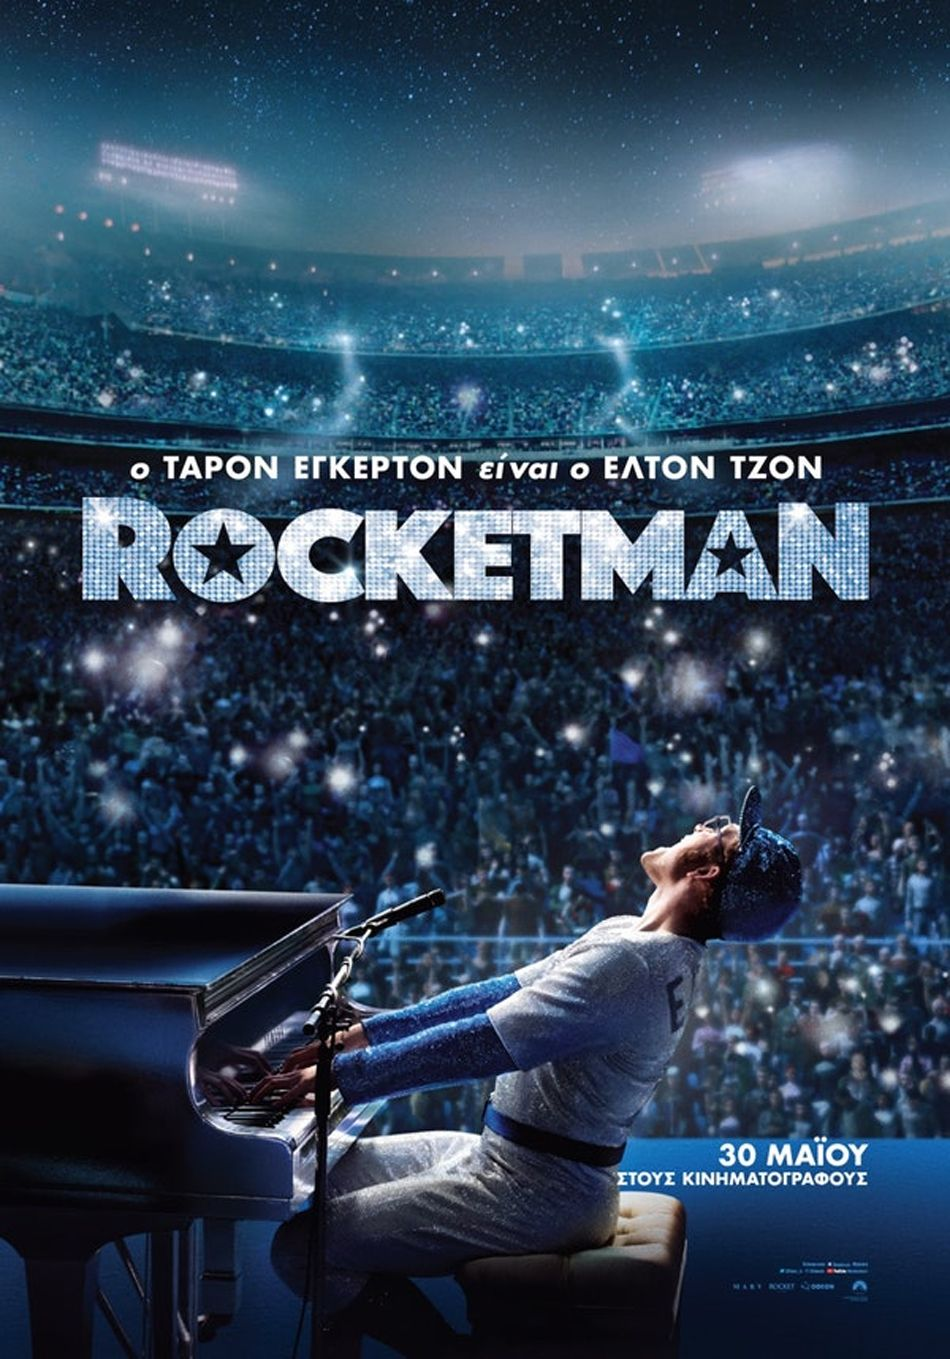 Rocketman Poster Πόστερ